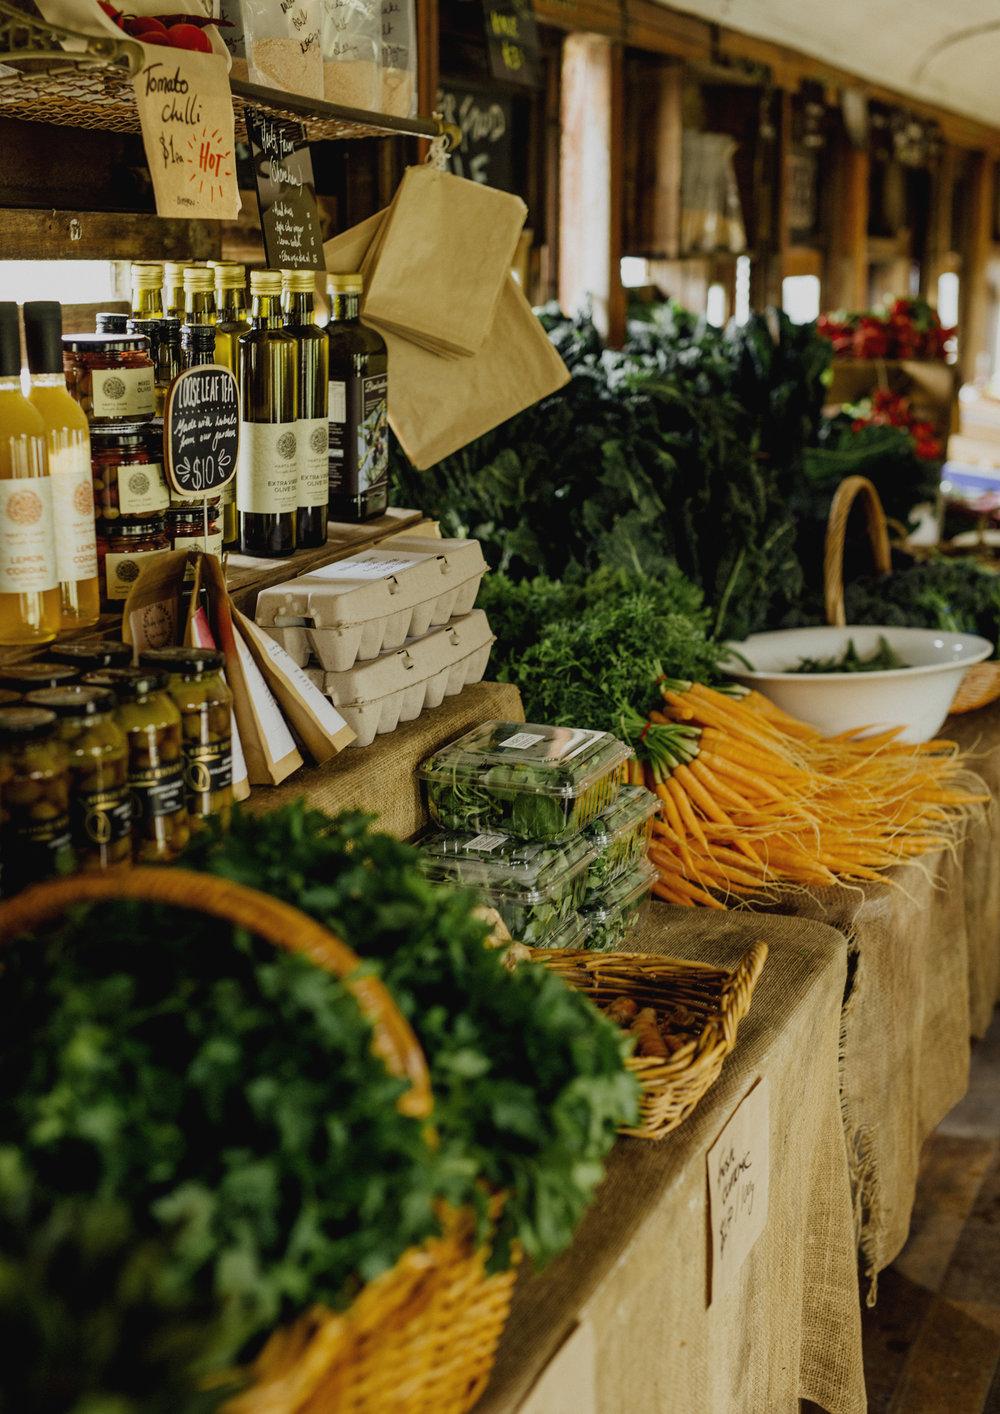 Fresh produce for sale at Benton Rise Farm